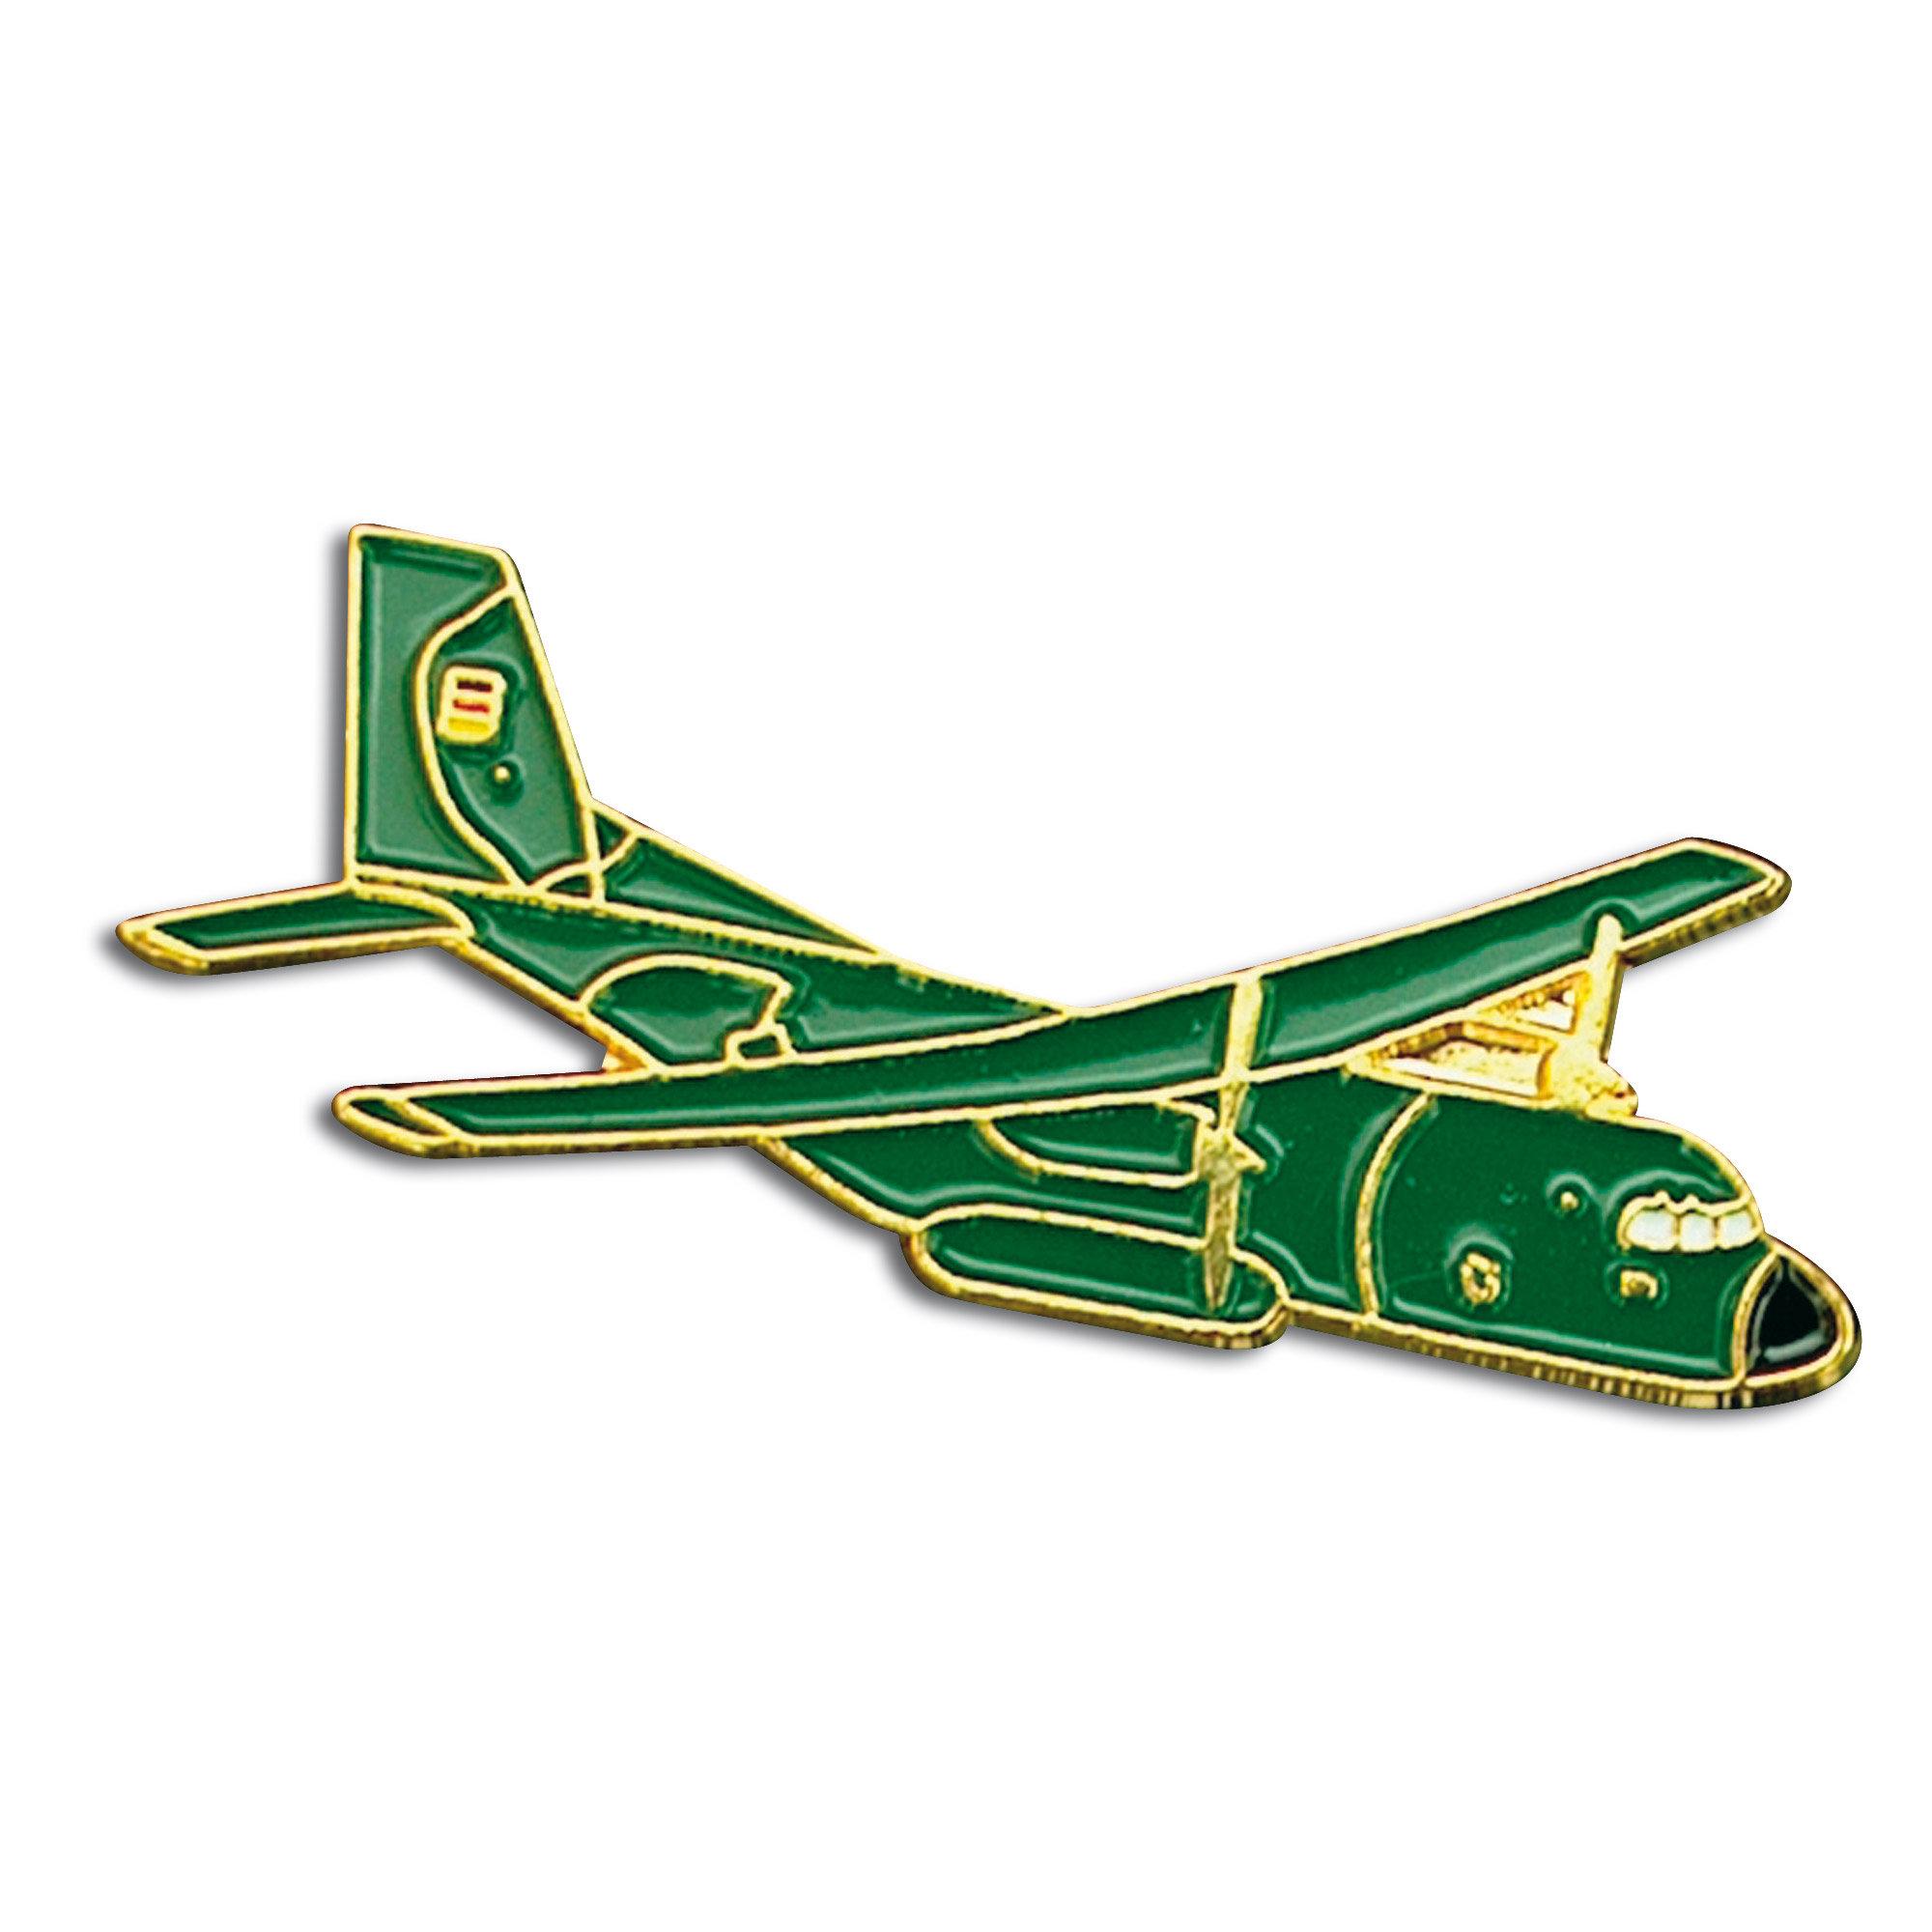 Mini - Pin metálico Transall verde